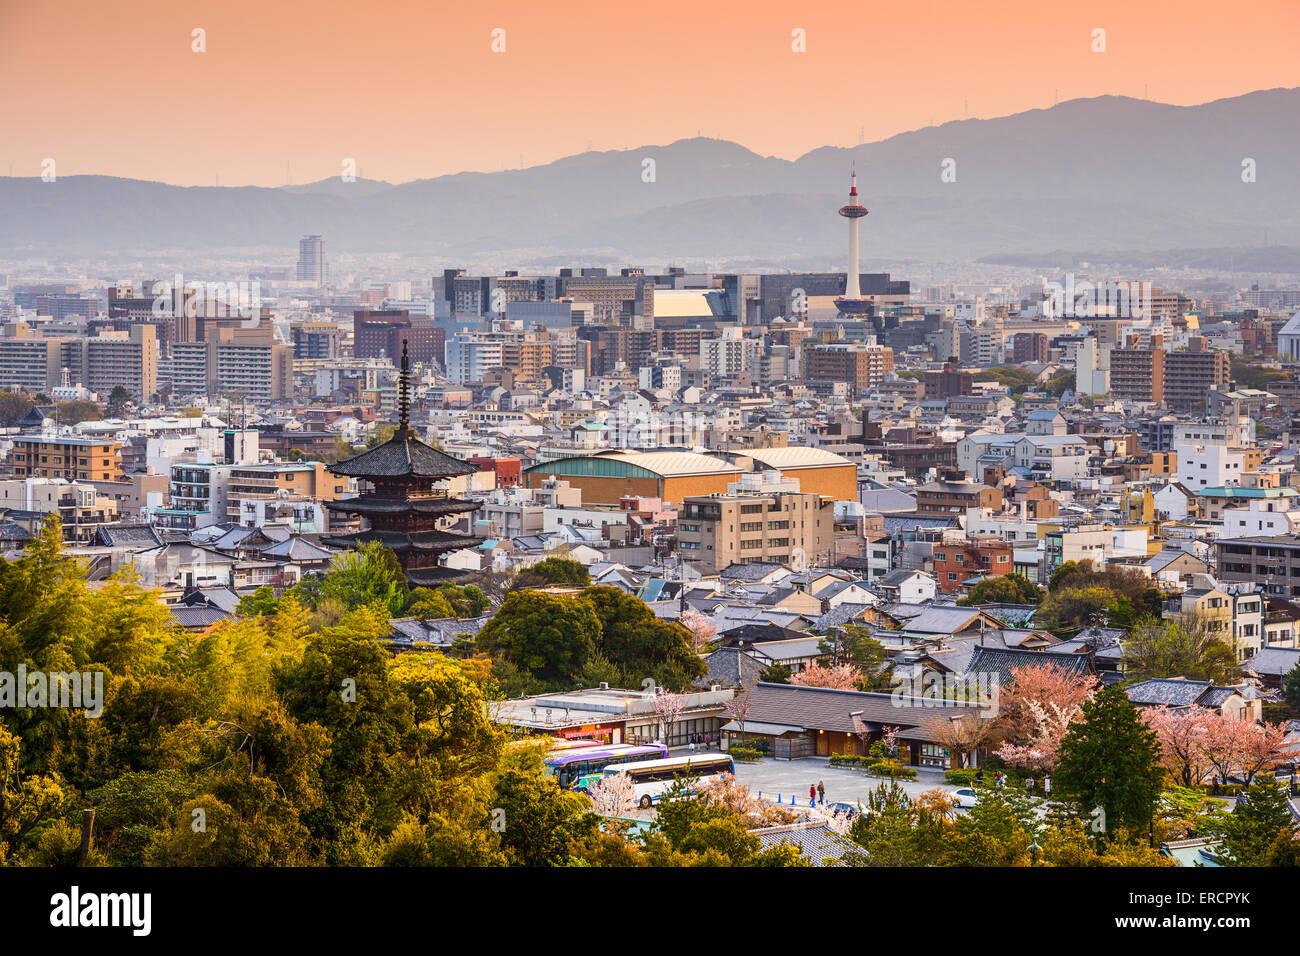 Kyoto, Japan city skyline at dusk. - Stock Image